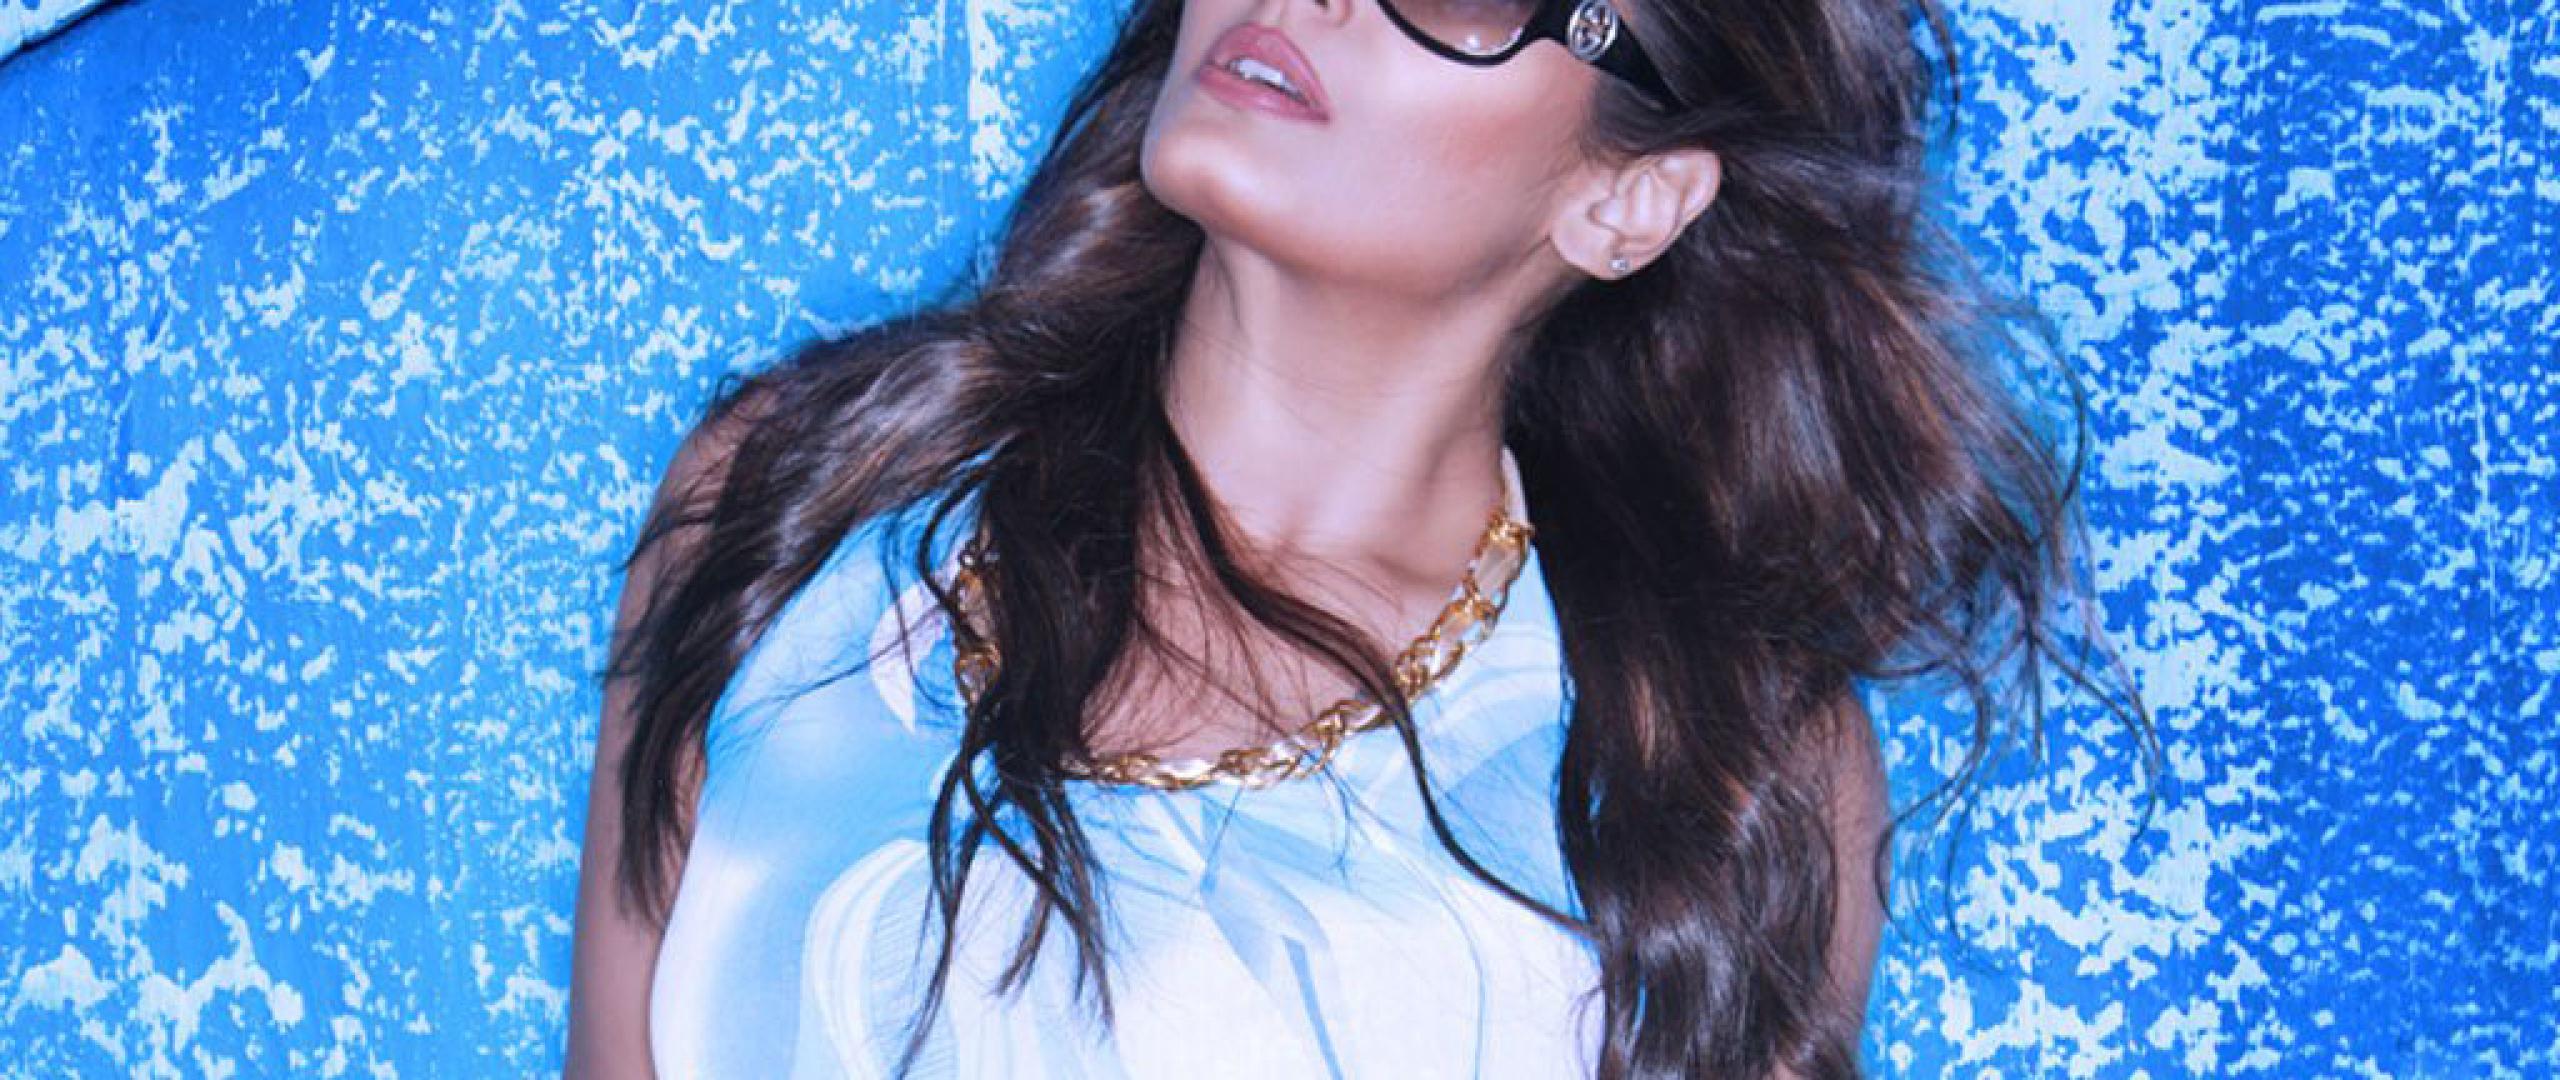 Raveena Tandon Hot In White Photoshoot, HD Wallpaper